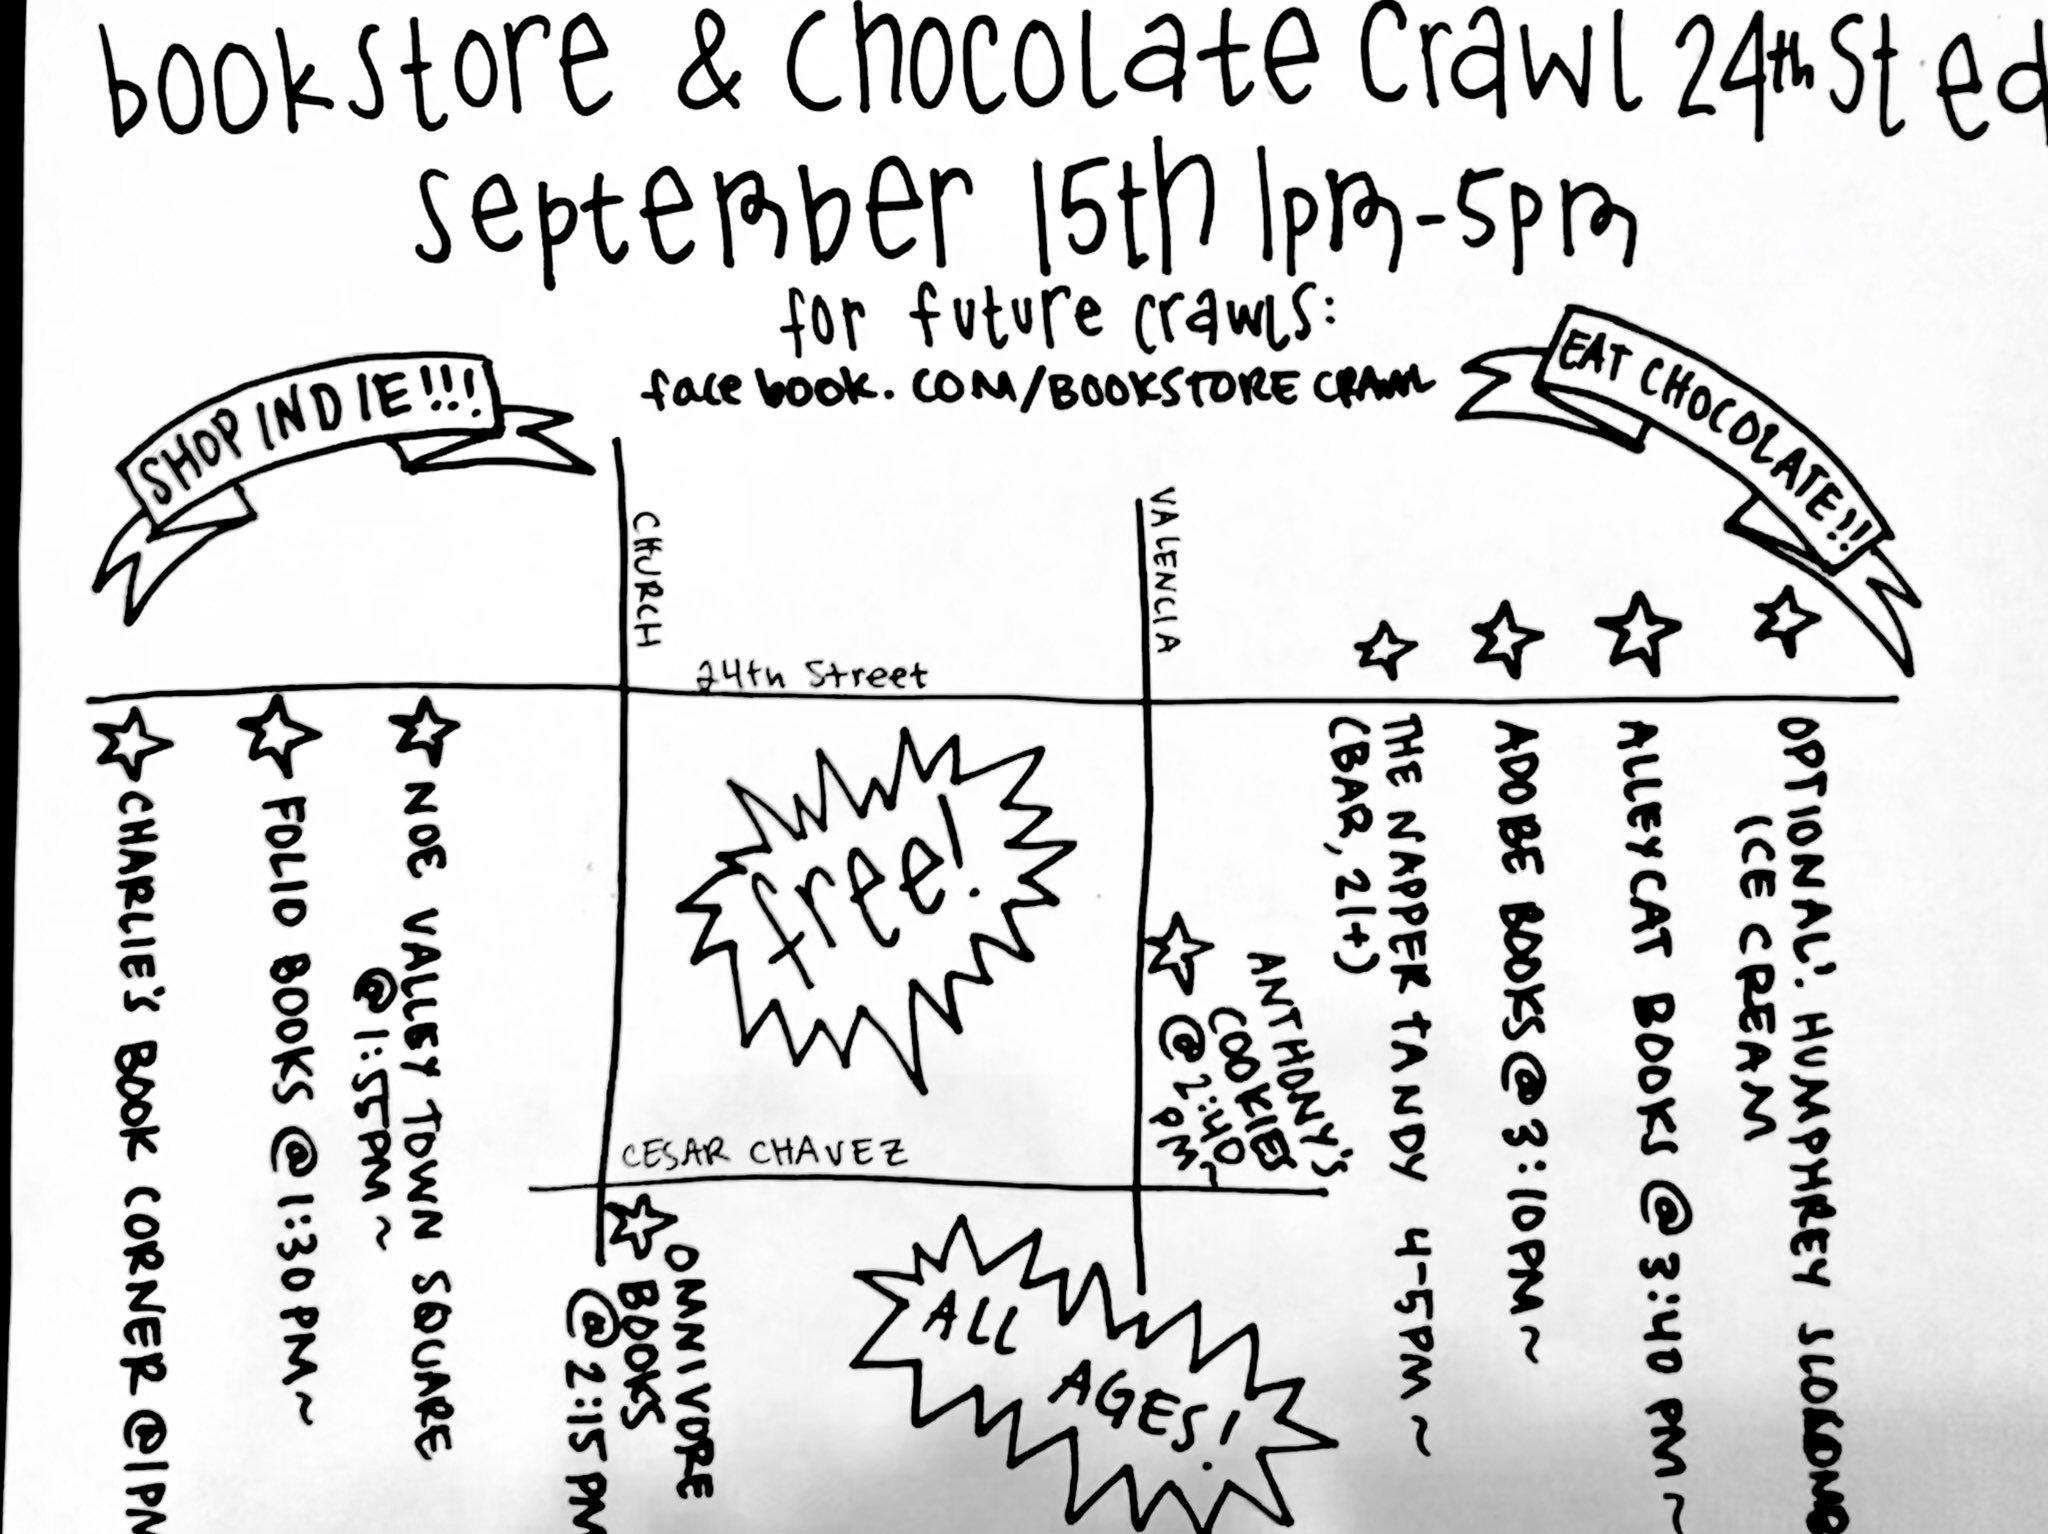 Bookstore&Chocolate Crawl Map 9.15.19